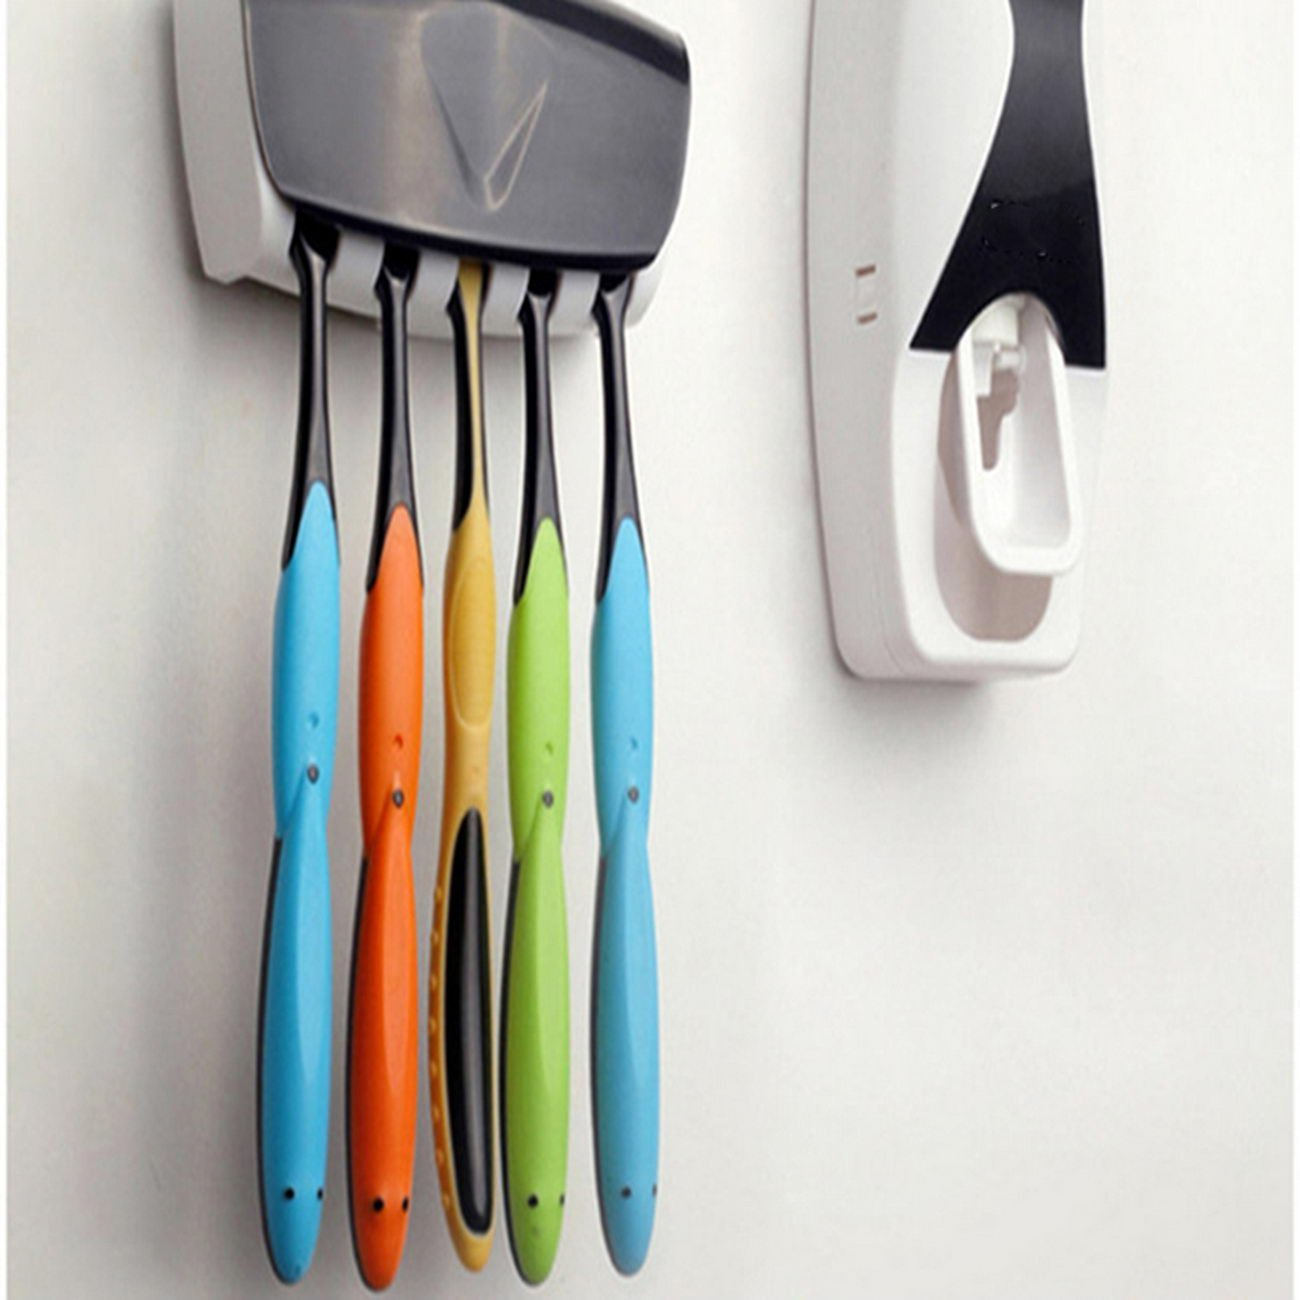 toothpaste dispenser creative automatic toothpaste dispenser toothbrush holder wash set, toothpaste dispenser, wash kit, creative toothpaste squeezer, toothpaste dispenser, toothpaste is a paragraph